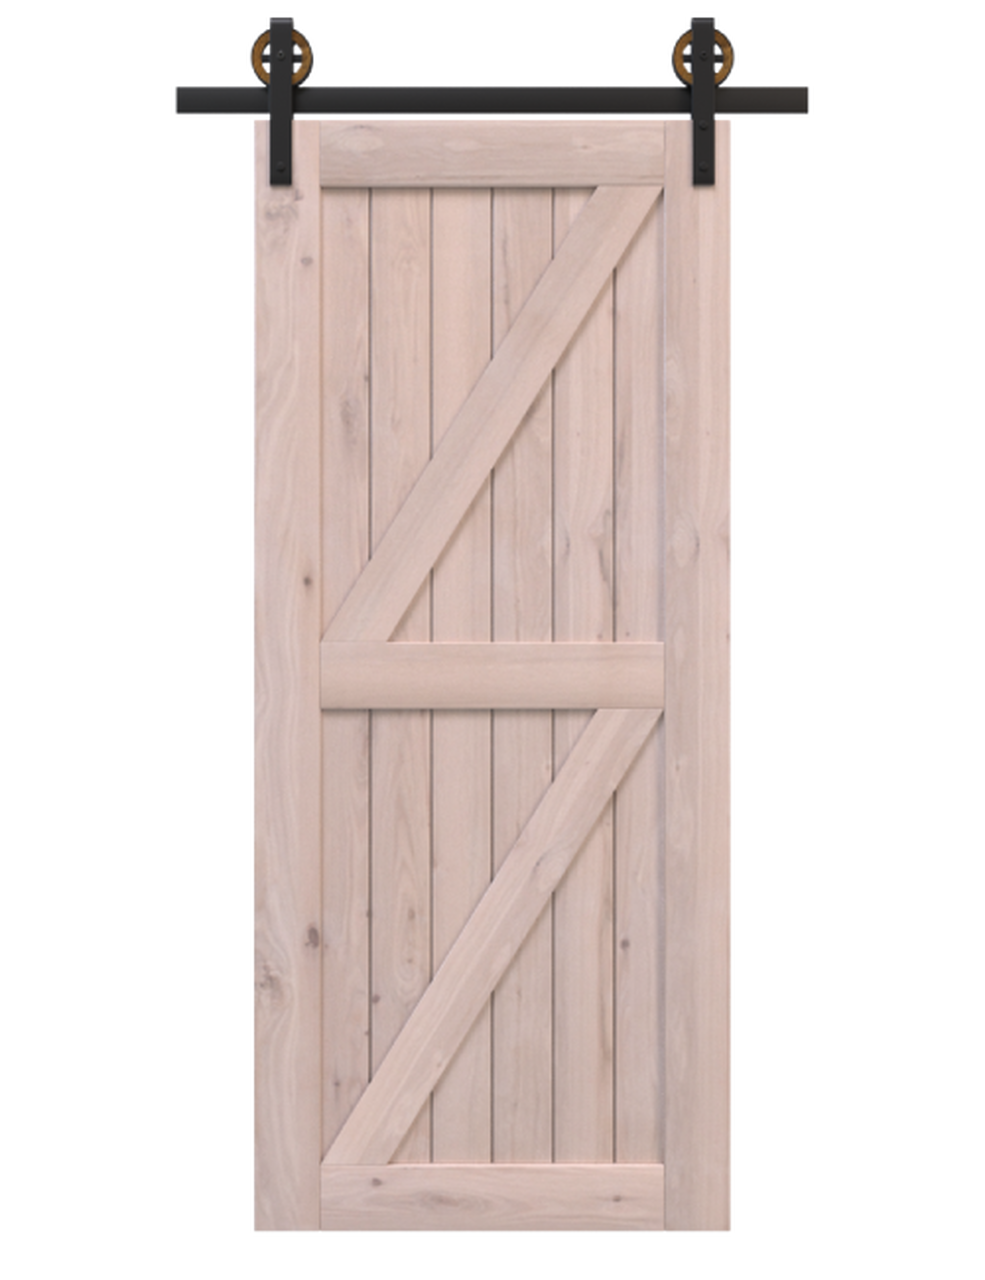 stowe unfinished wood double diagonal pattern barn door